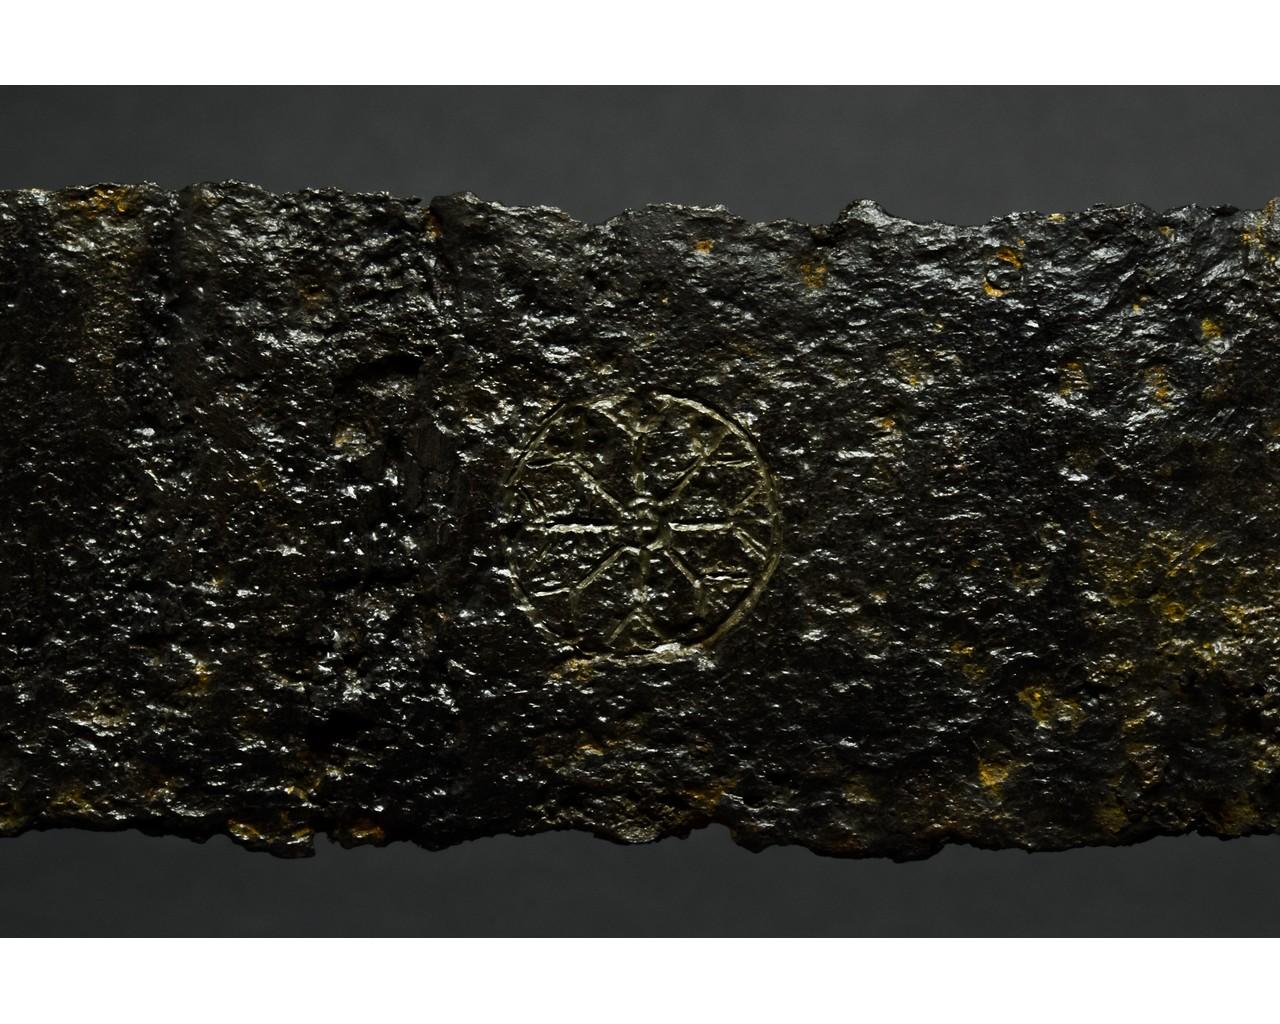 LATE ROMAN IRON SPATHA SWORD - Image 4 of 7